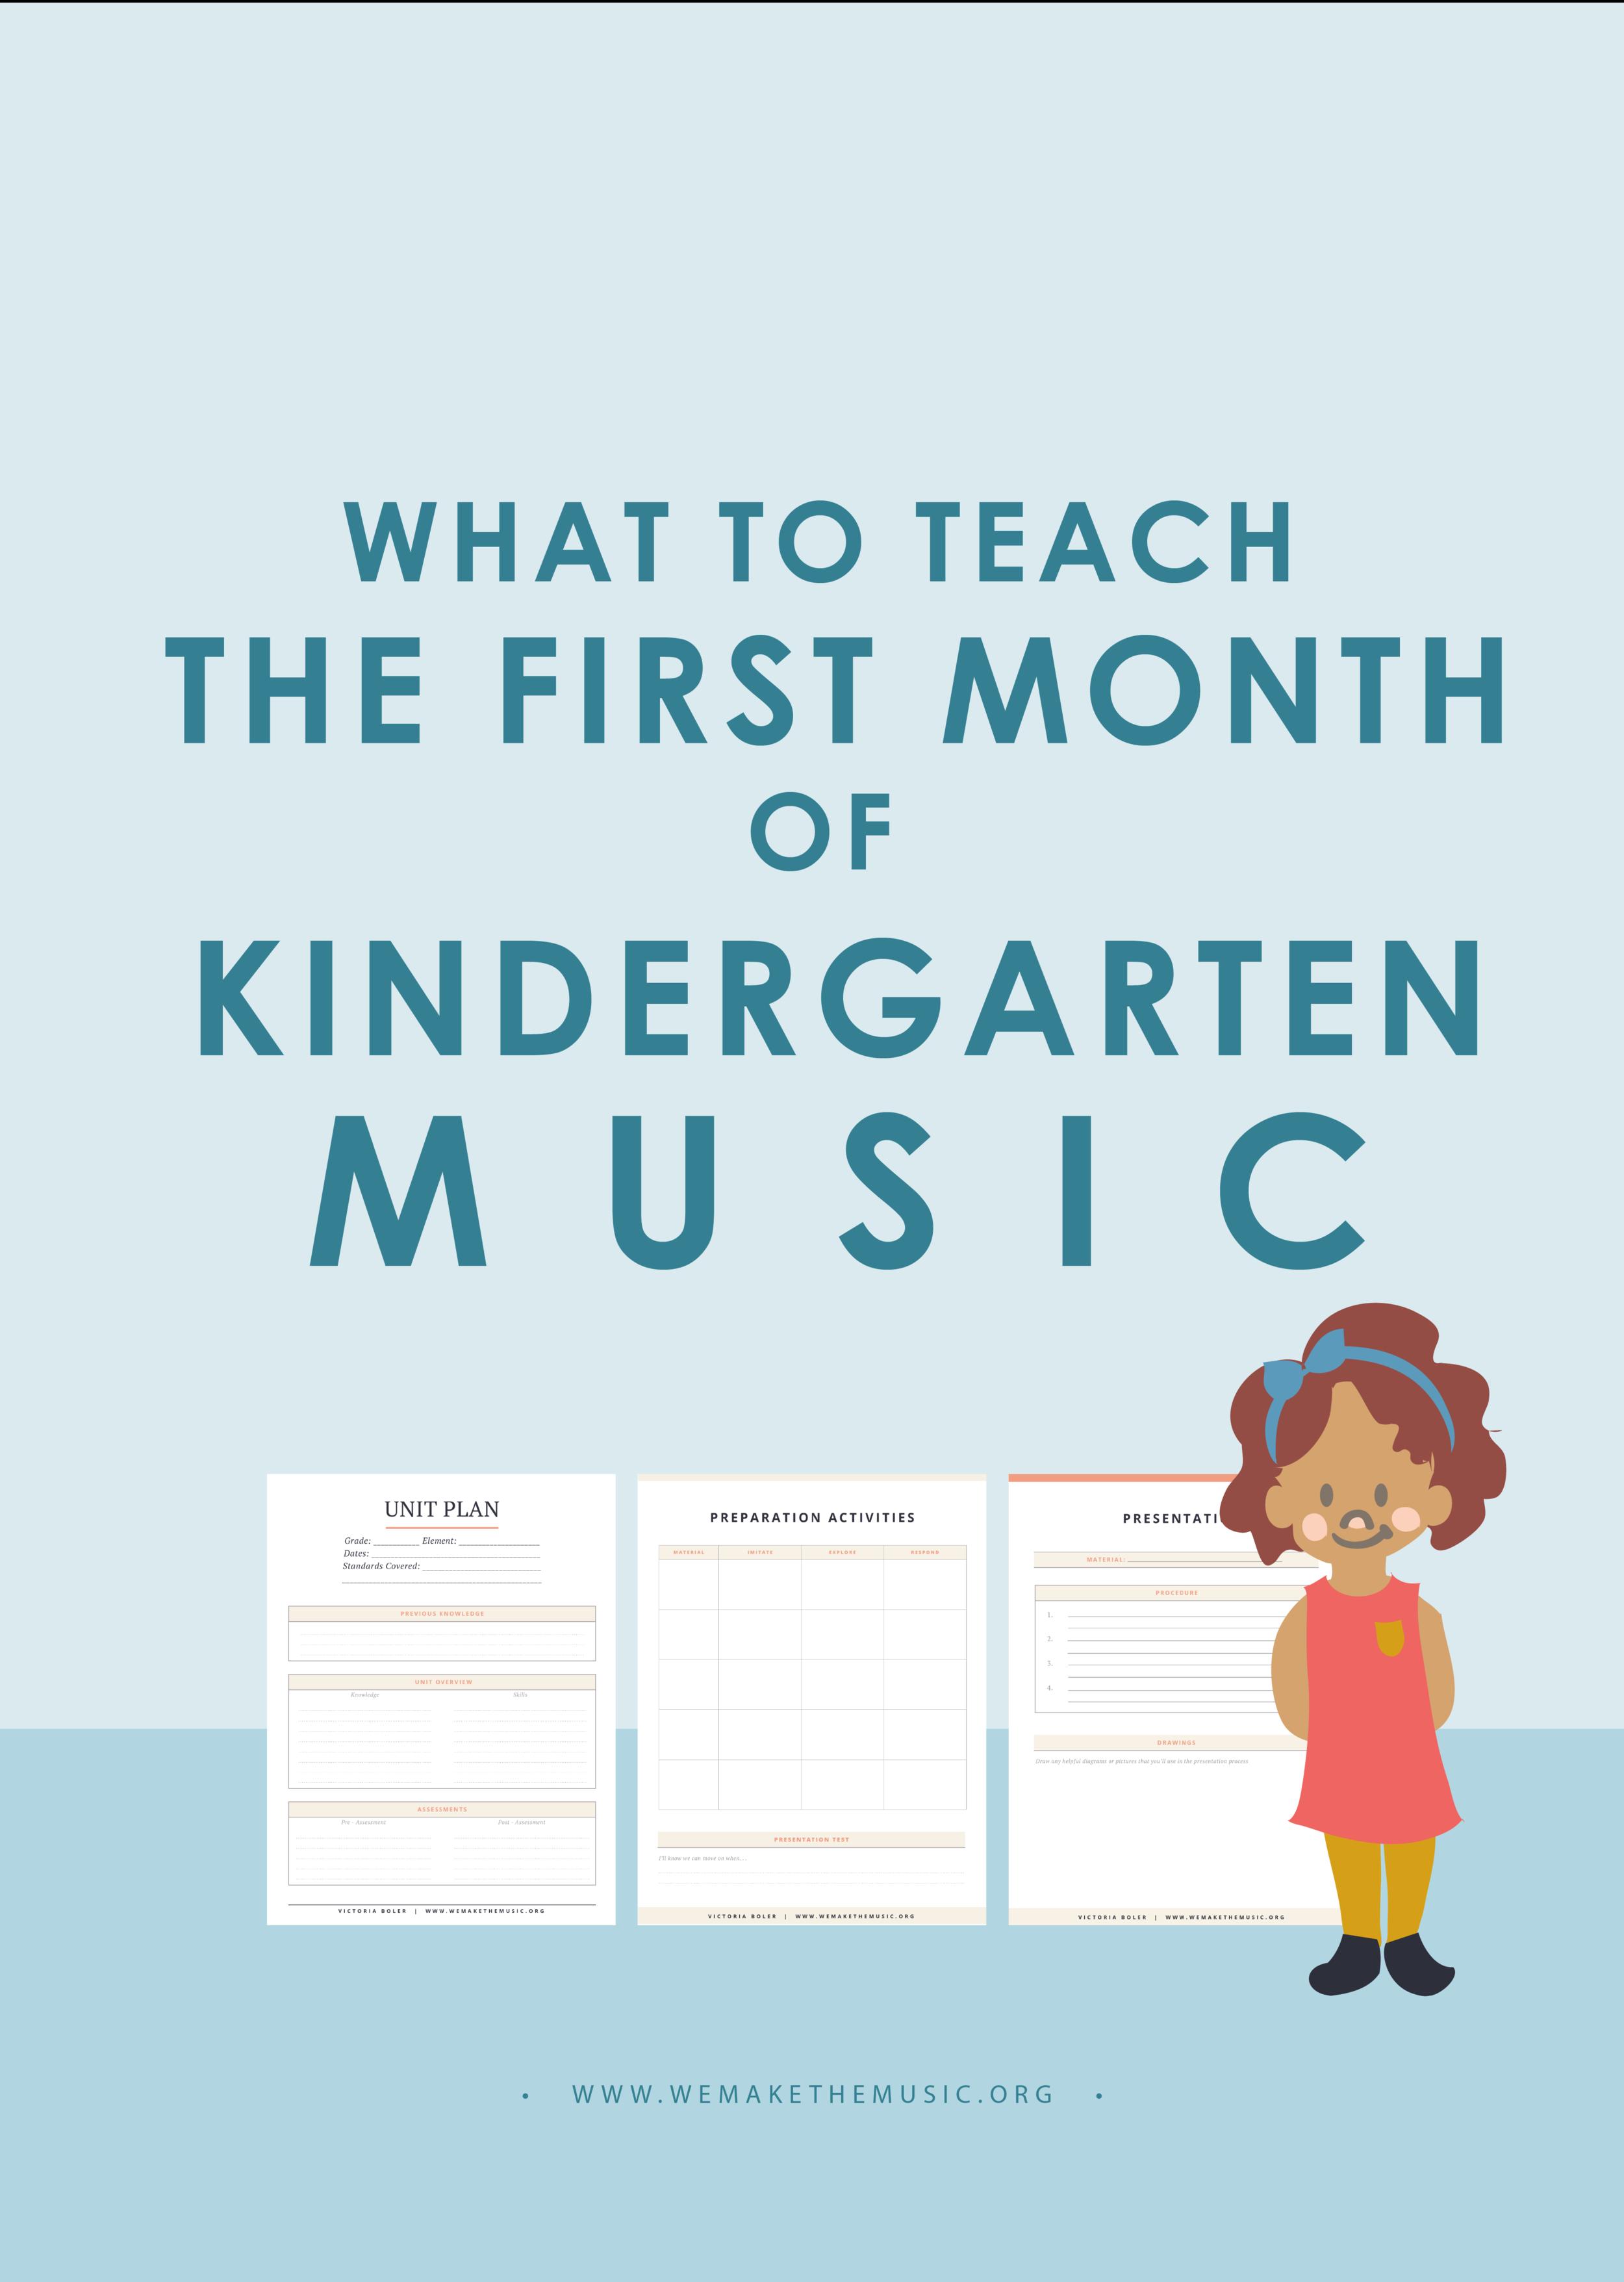 What to Teach The First Month of Kindergarten Music_9-26 Kindergarten Music.png